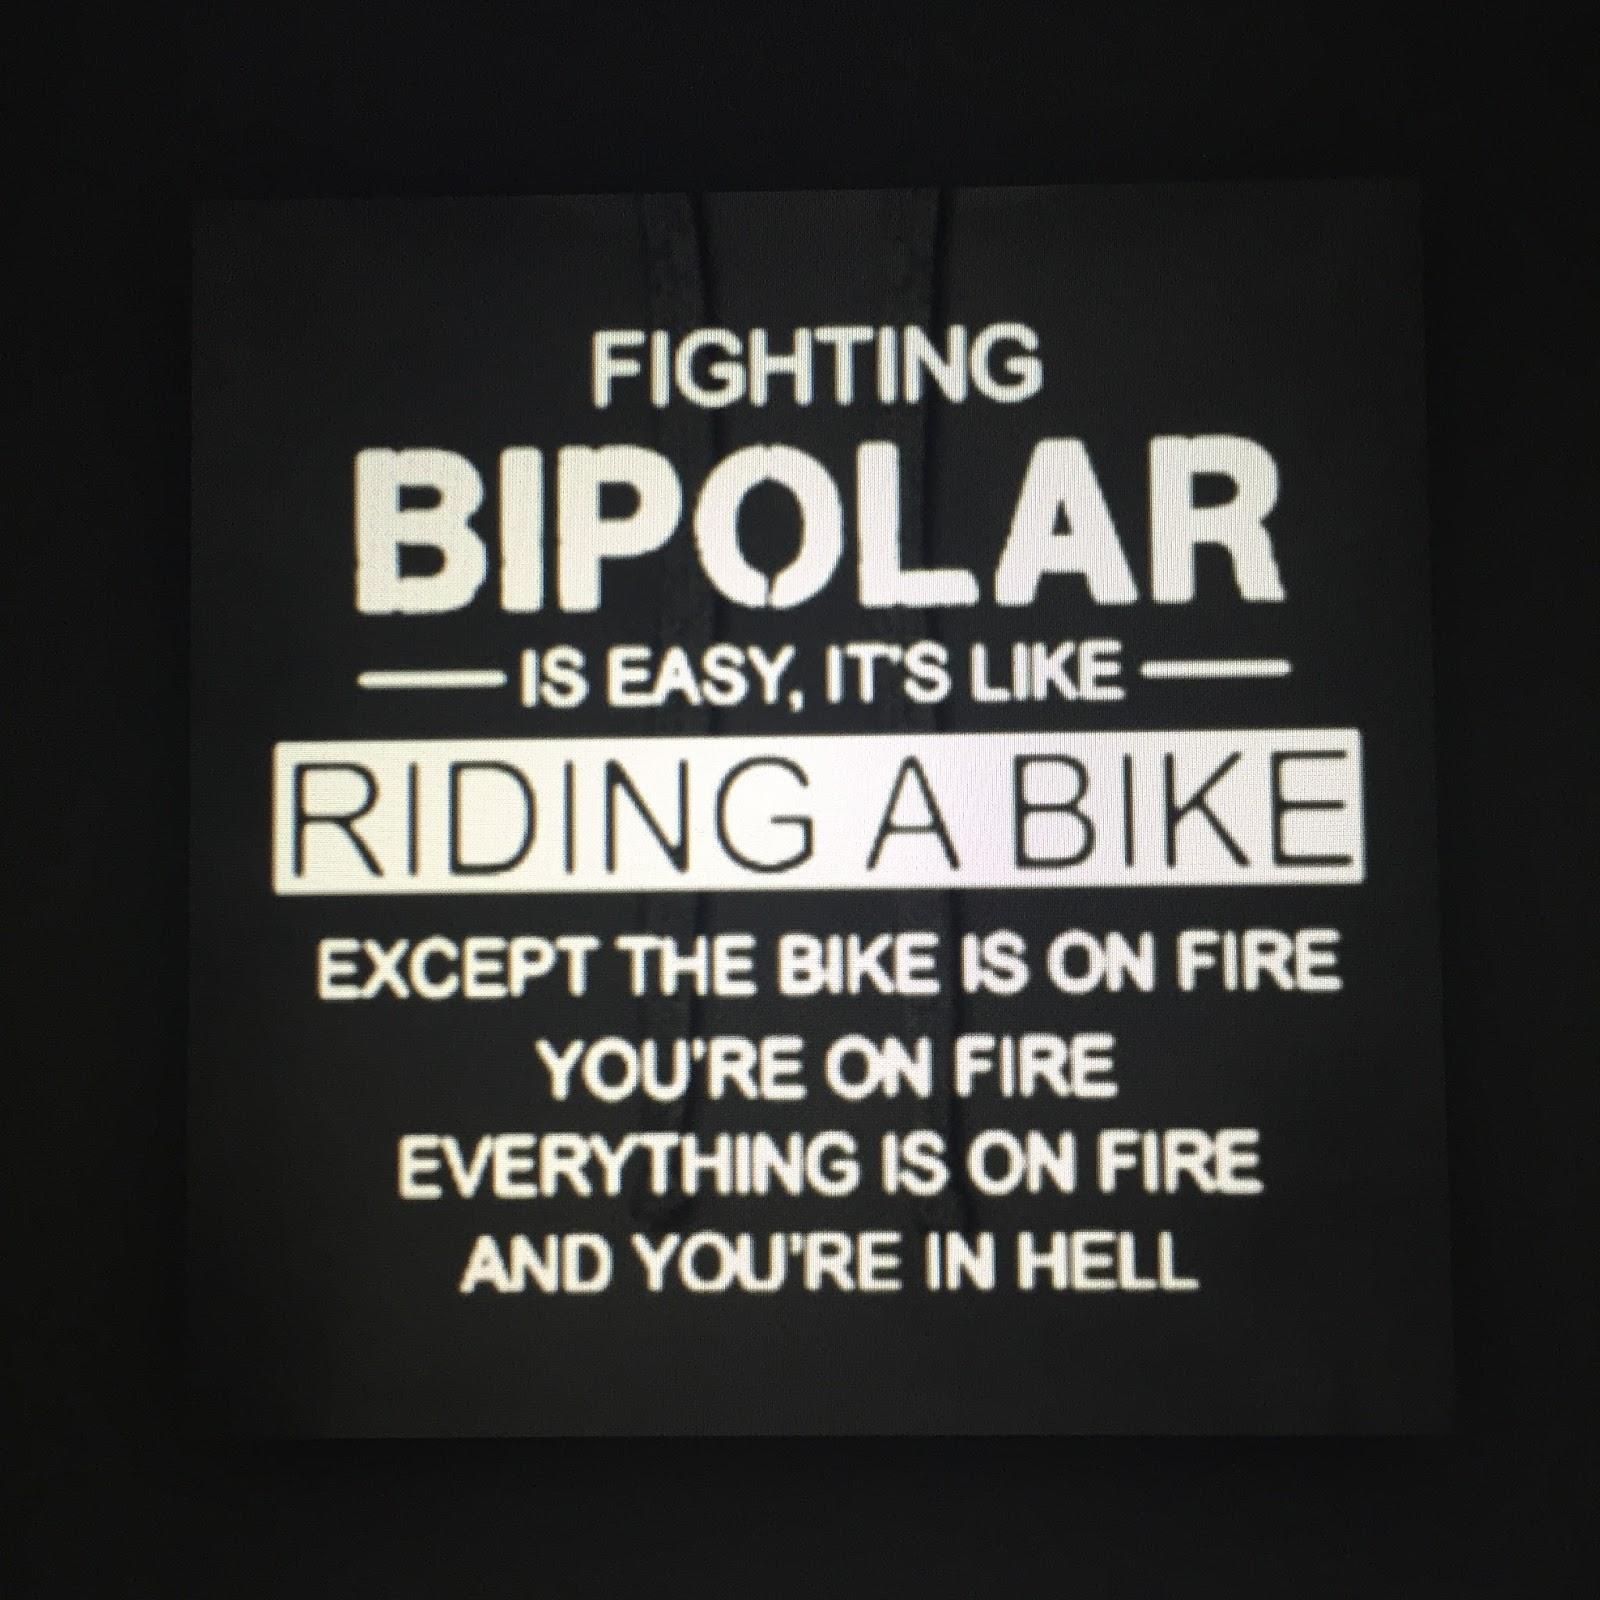 funny bipolar meme